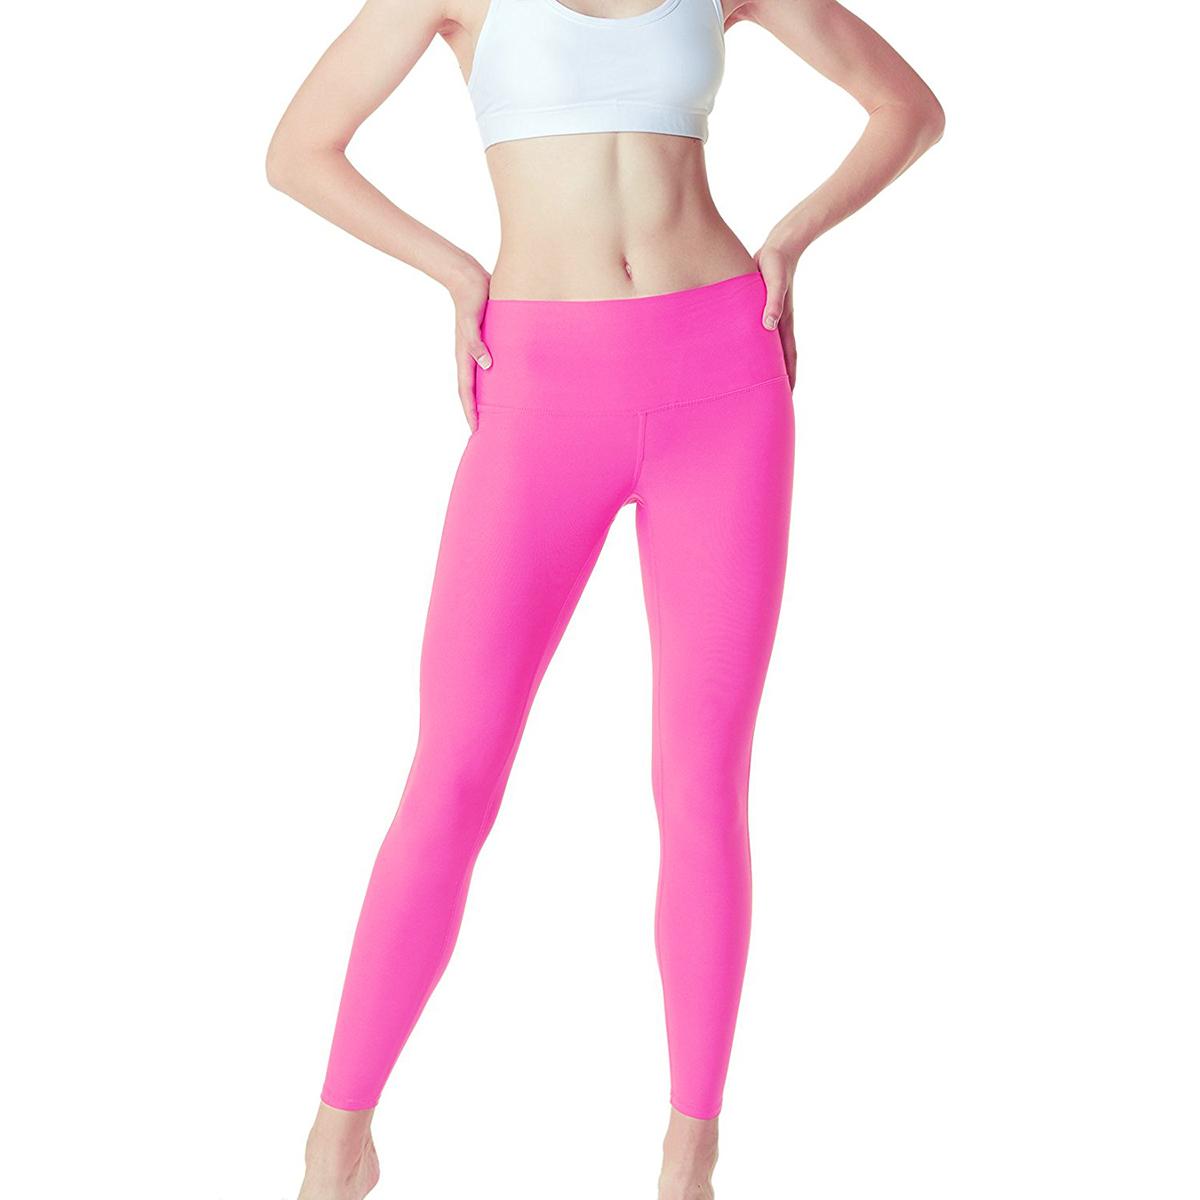 thumbnail 49 - TSLA Tesla FYP42 Women's High-Waisted Ultra-Stretch Tummy Control Yoga Pants